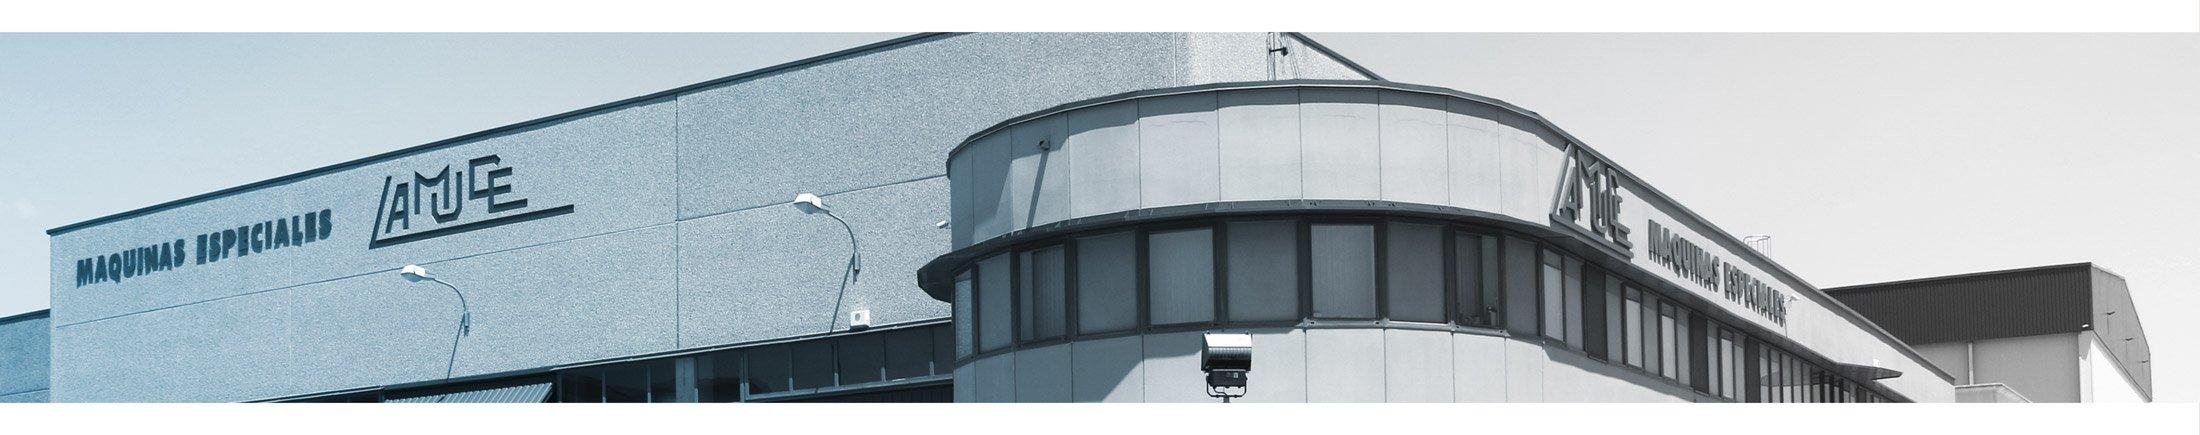 fachada exterior de Automatizaciones Lamuce